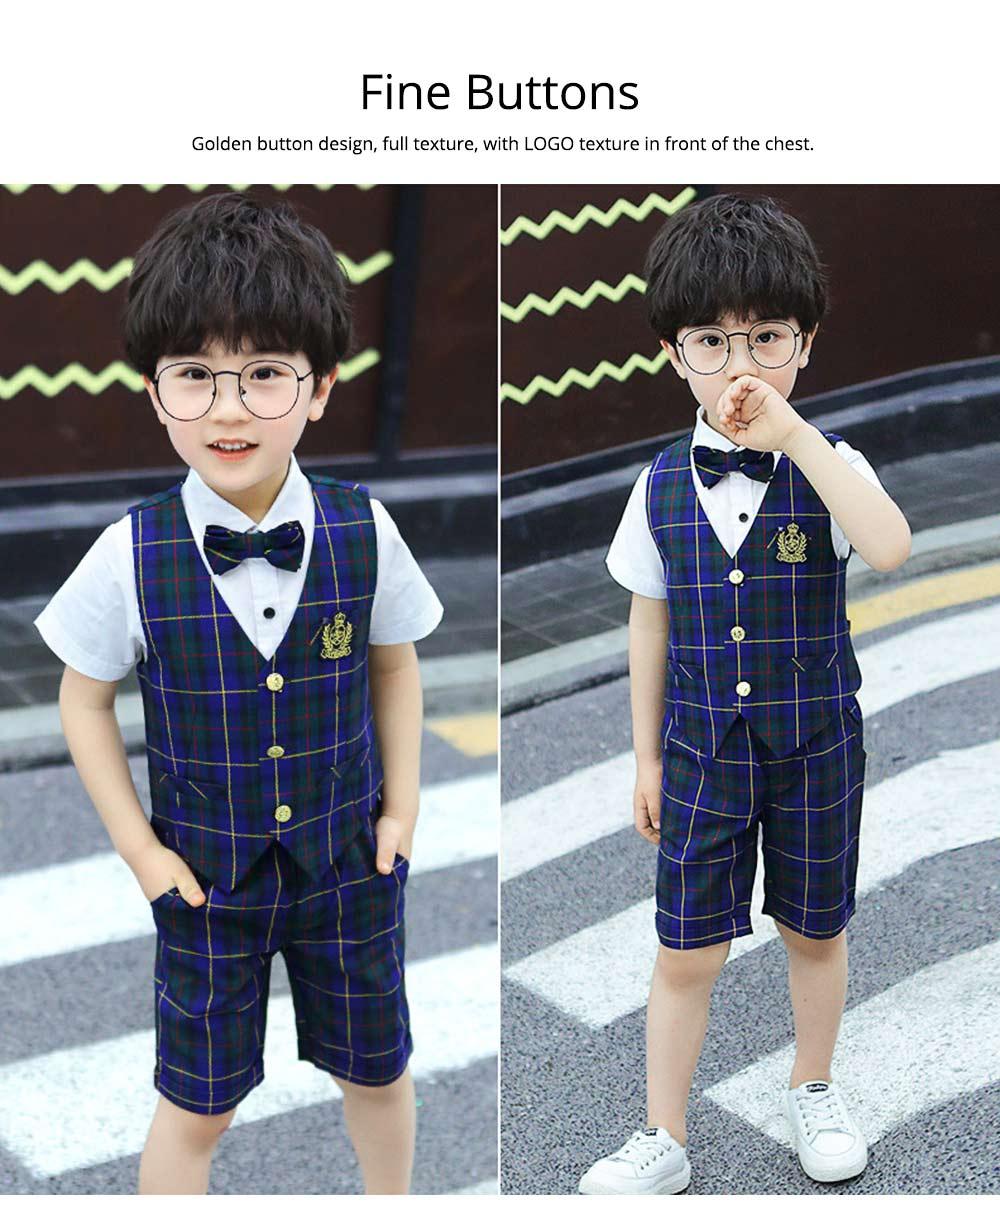 Children's Suit Waistcoat Suit, Korean Flower Children's Dress Suit, Handsome Boy Suit 3